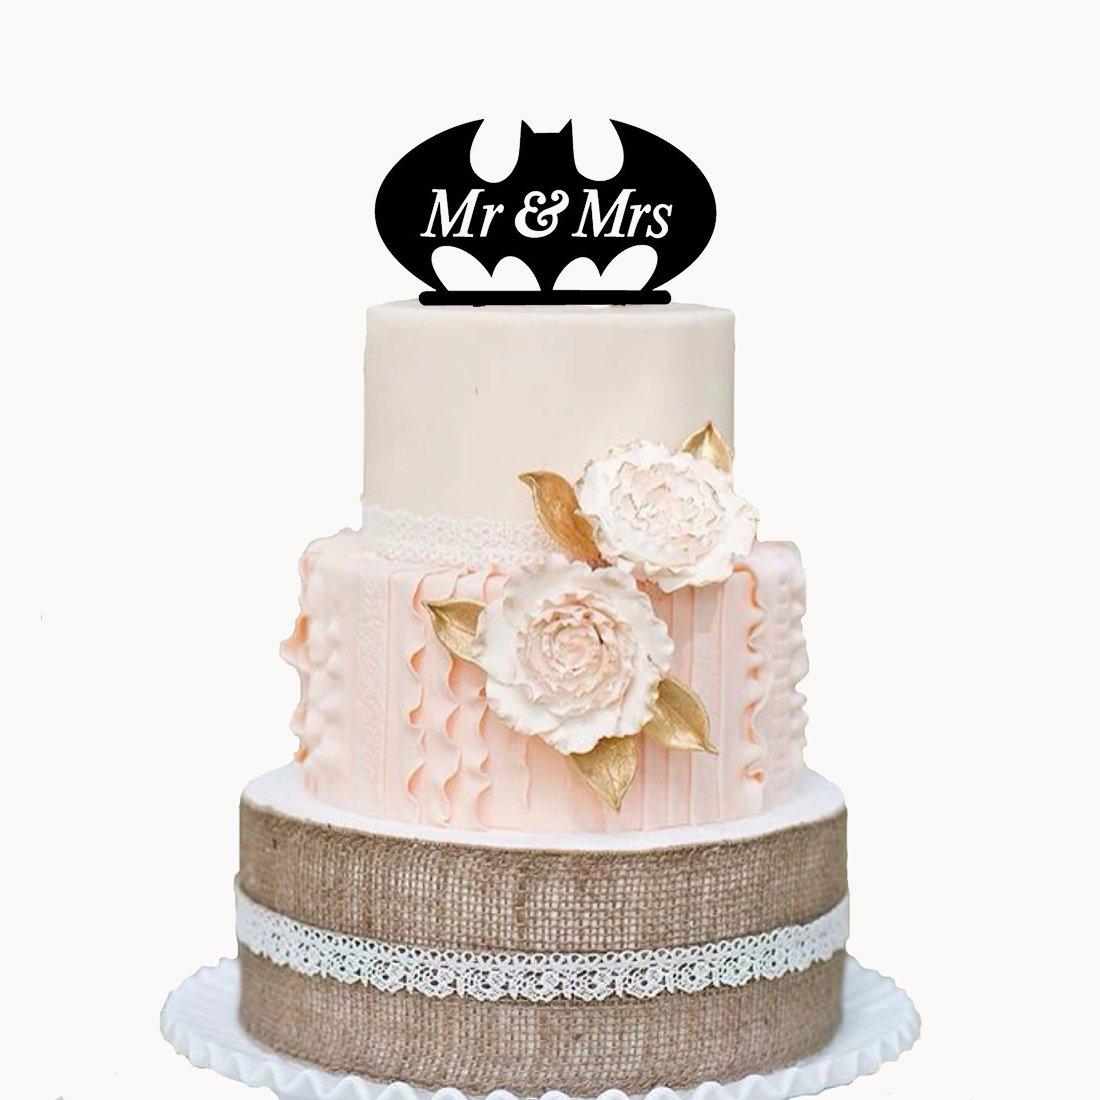 Cheap Bat Cake, find Bat Cake deals on line at Alibaba.com